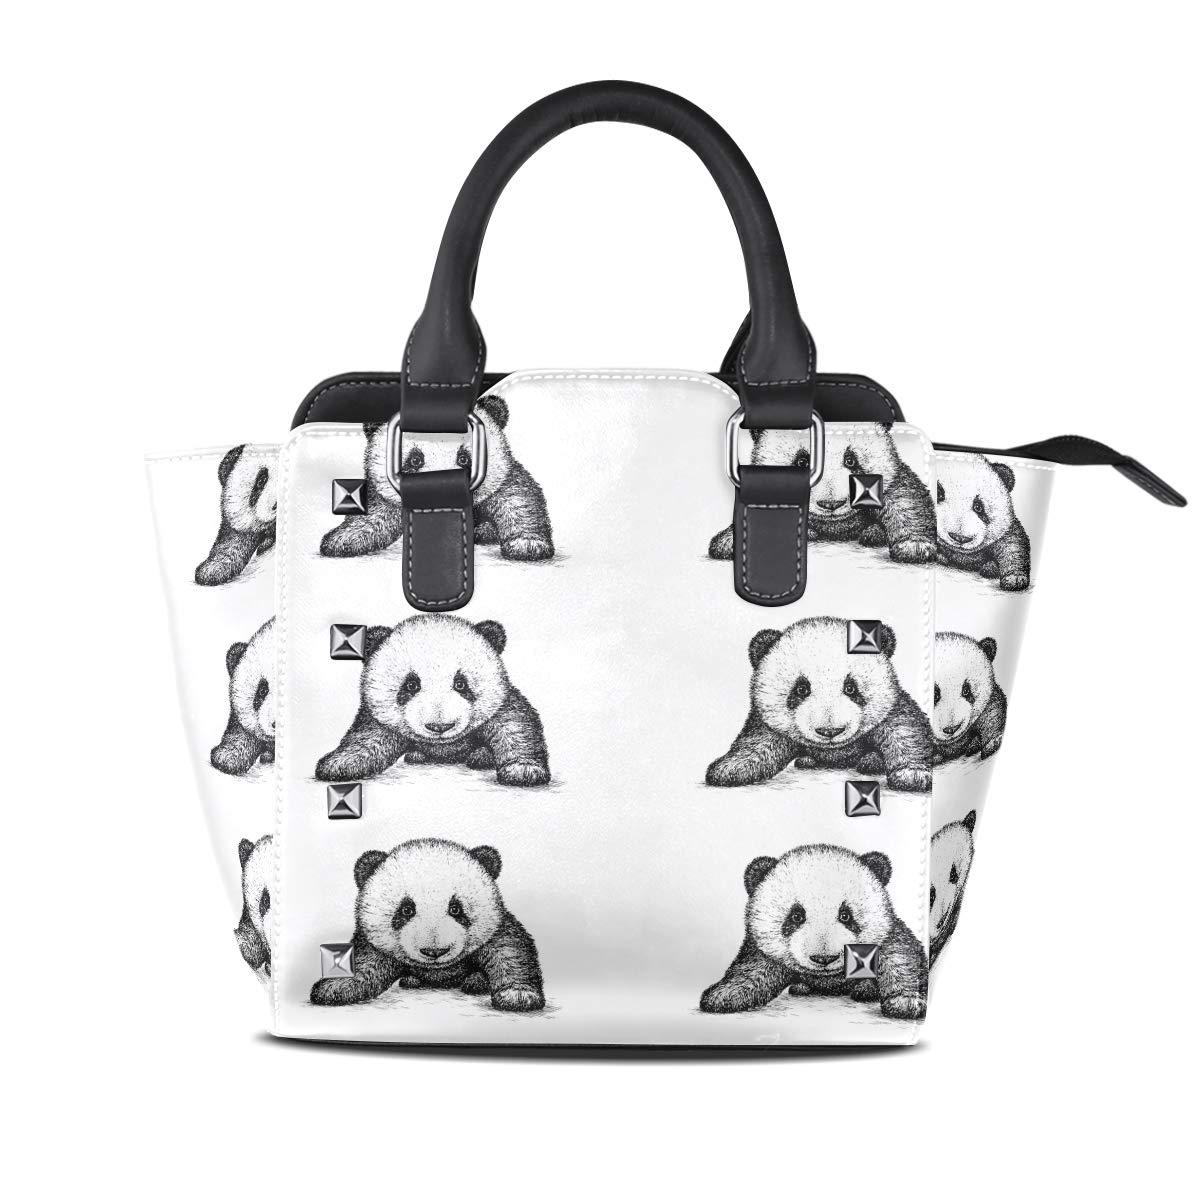 Design2 Handbag Elephant And Balloon Genuine Leather Tote Rivet Bag Shoulder Strap Top Handle Women